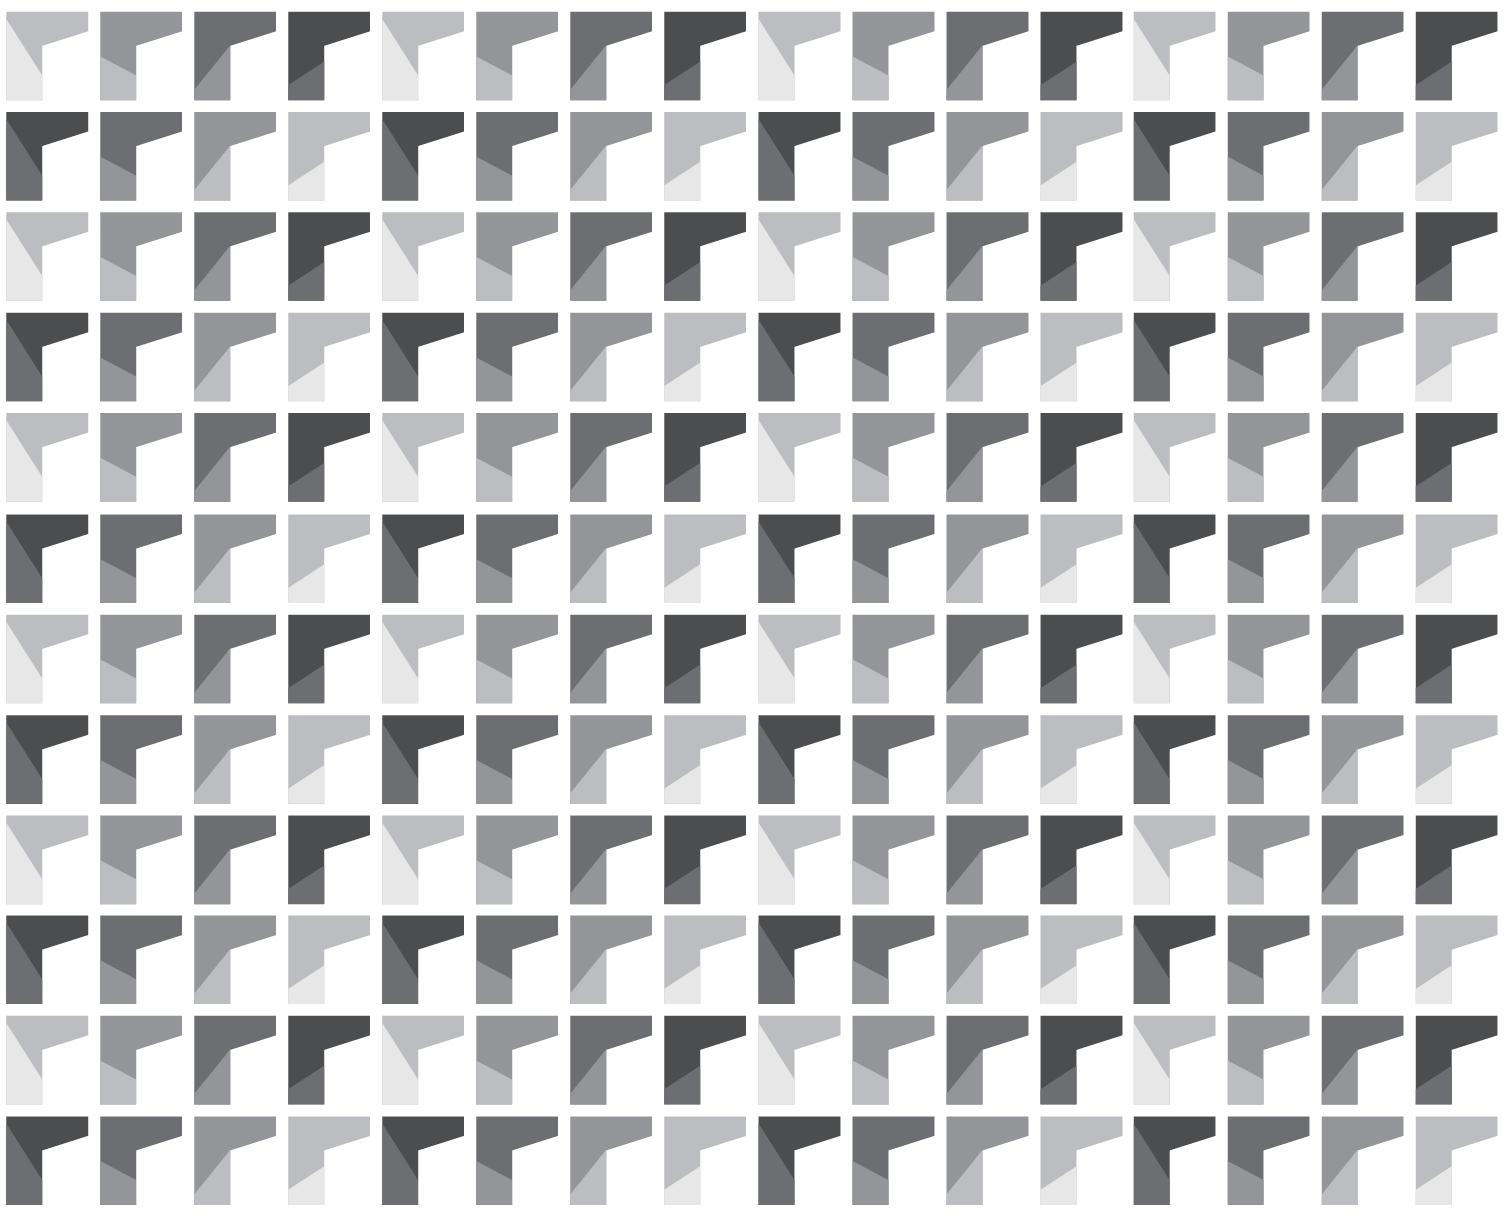 Brand pattern in grey scale